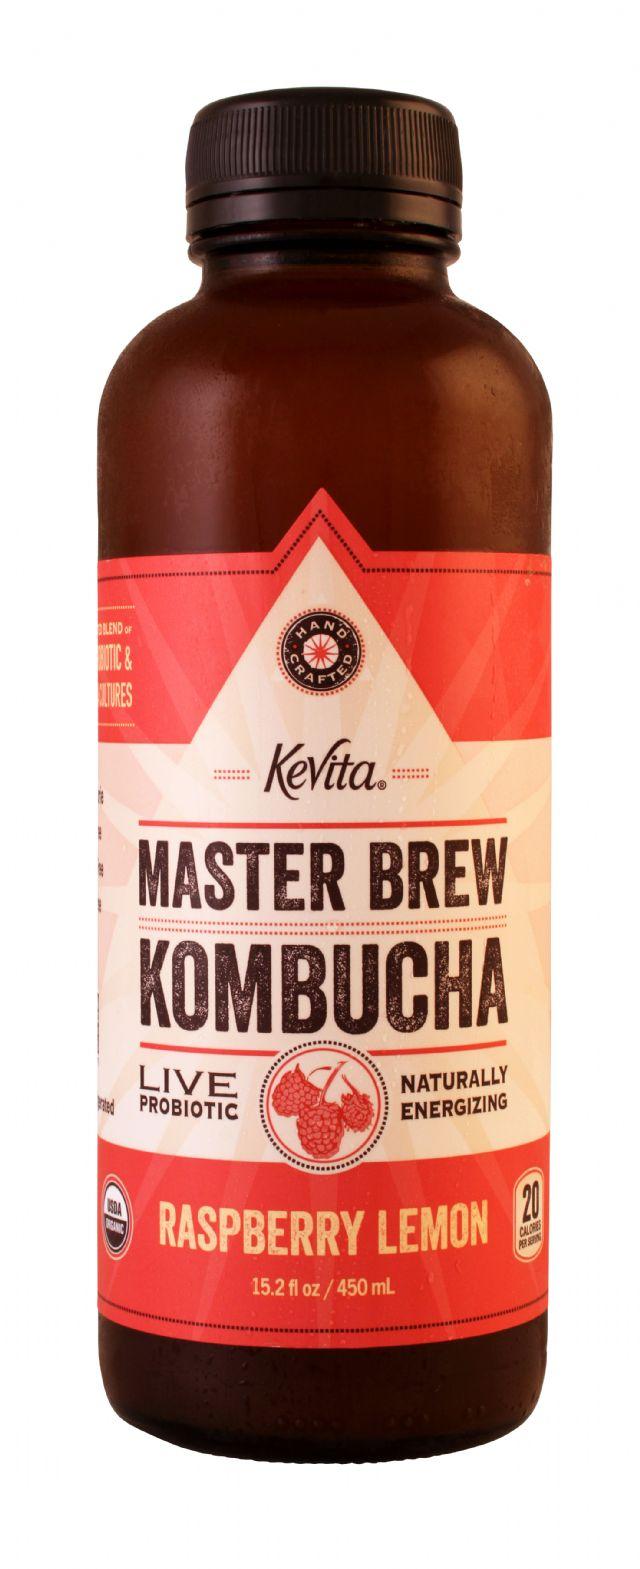 KeVita Master Brew Kombucha: Kevita RaspberryLem Front